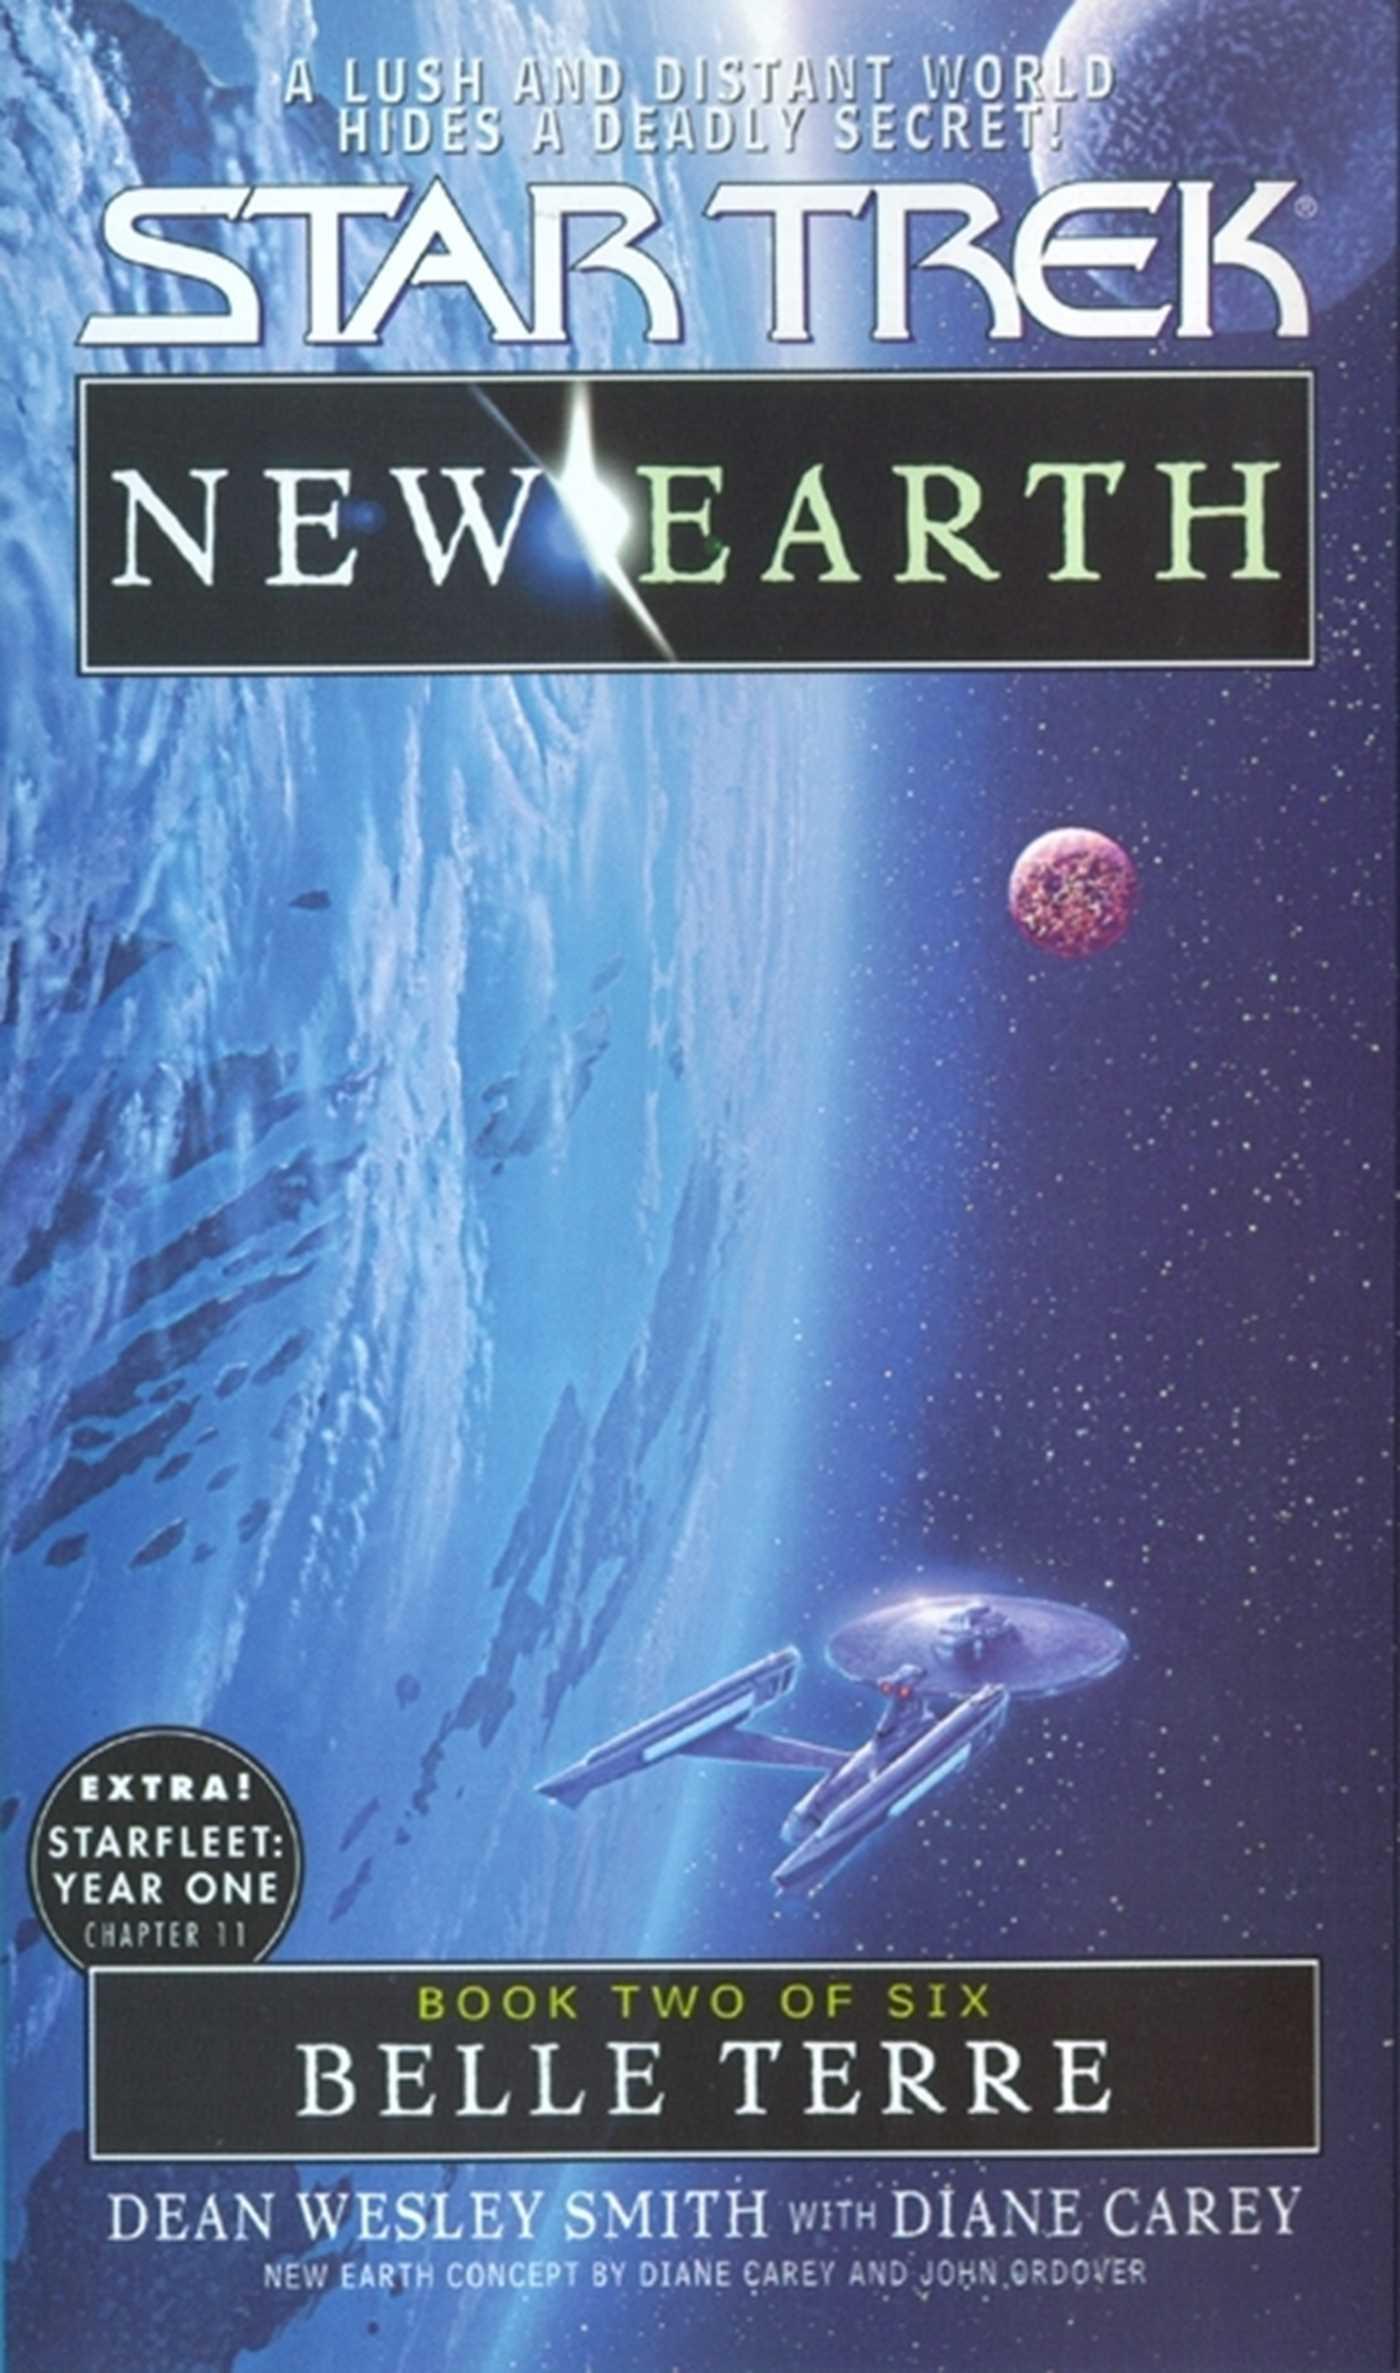 Belle terre st new earth 2 9780743411158 hr